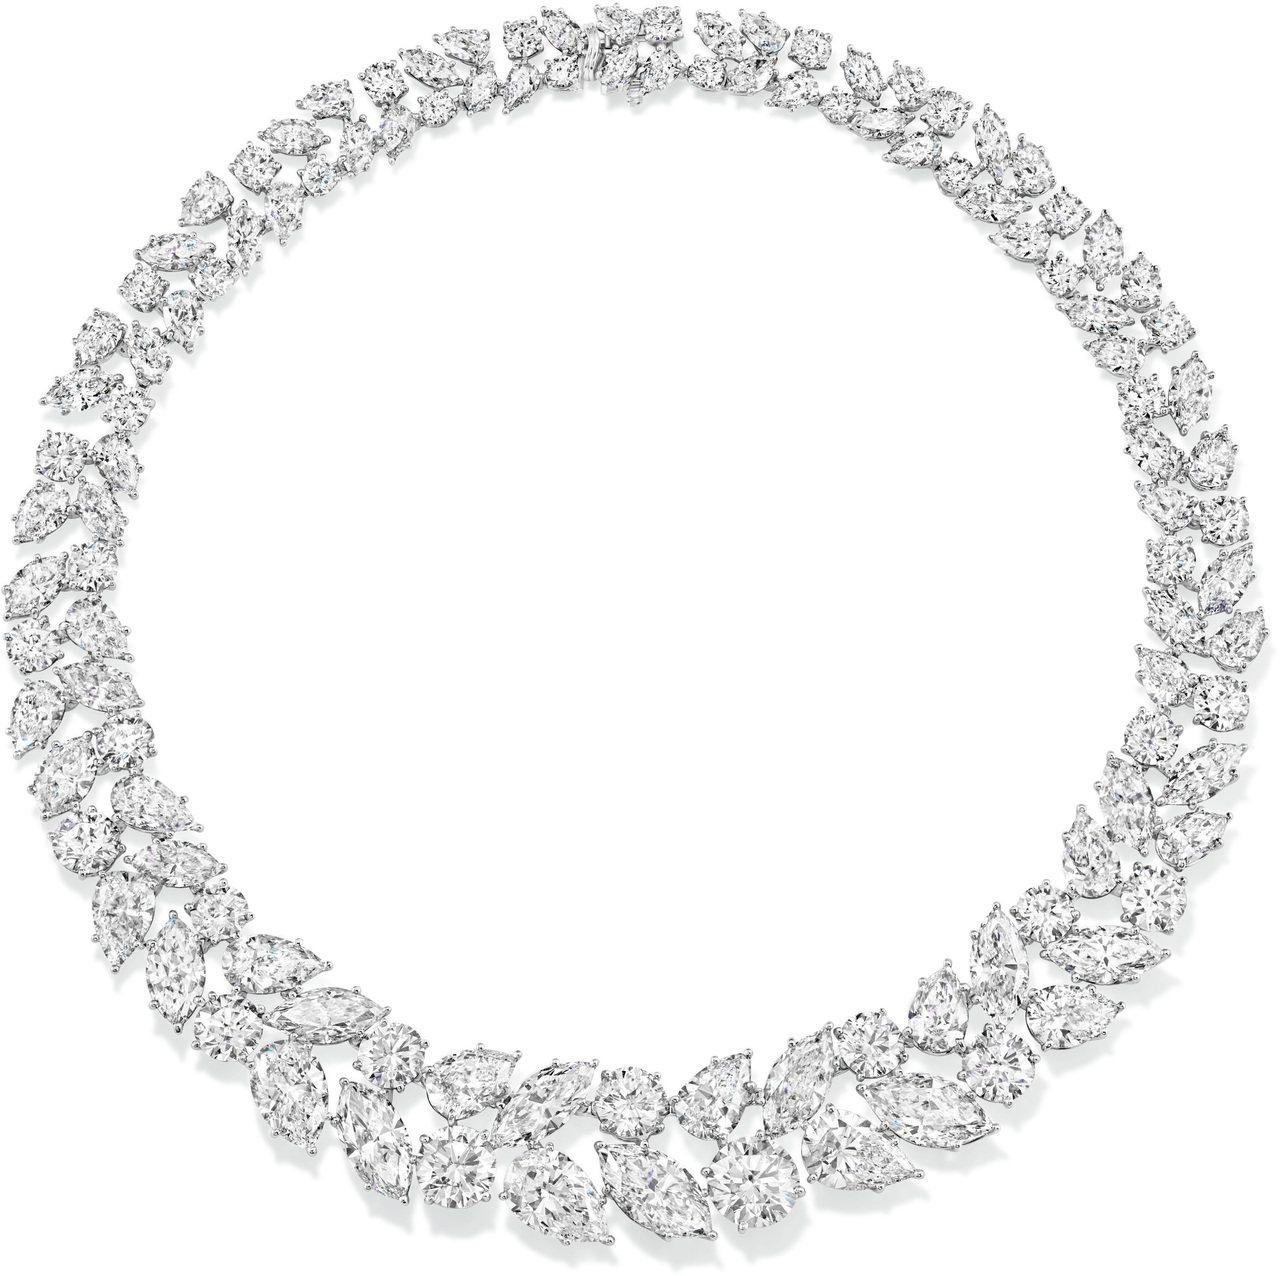 Winston Cluster經典溫斯頓風格Wreath鑽石項鍊。圖/海瑞溫斯頓...